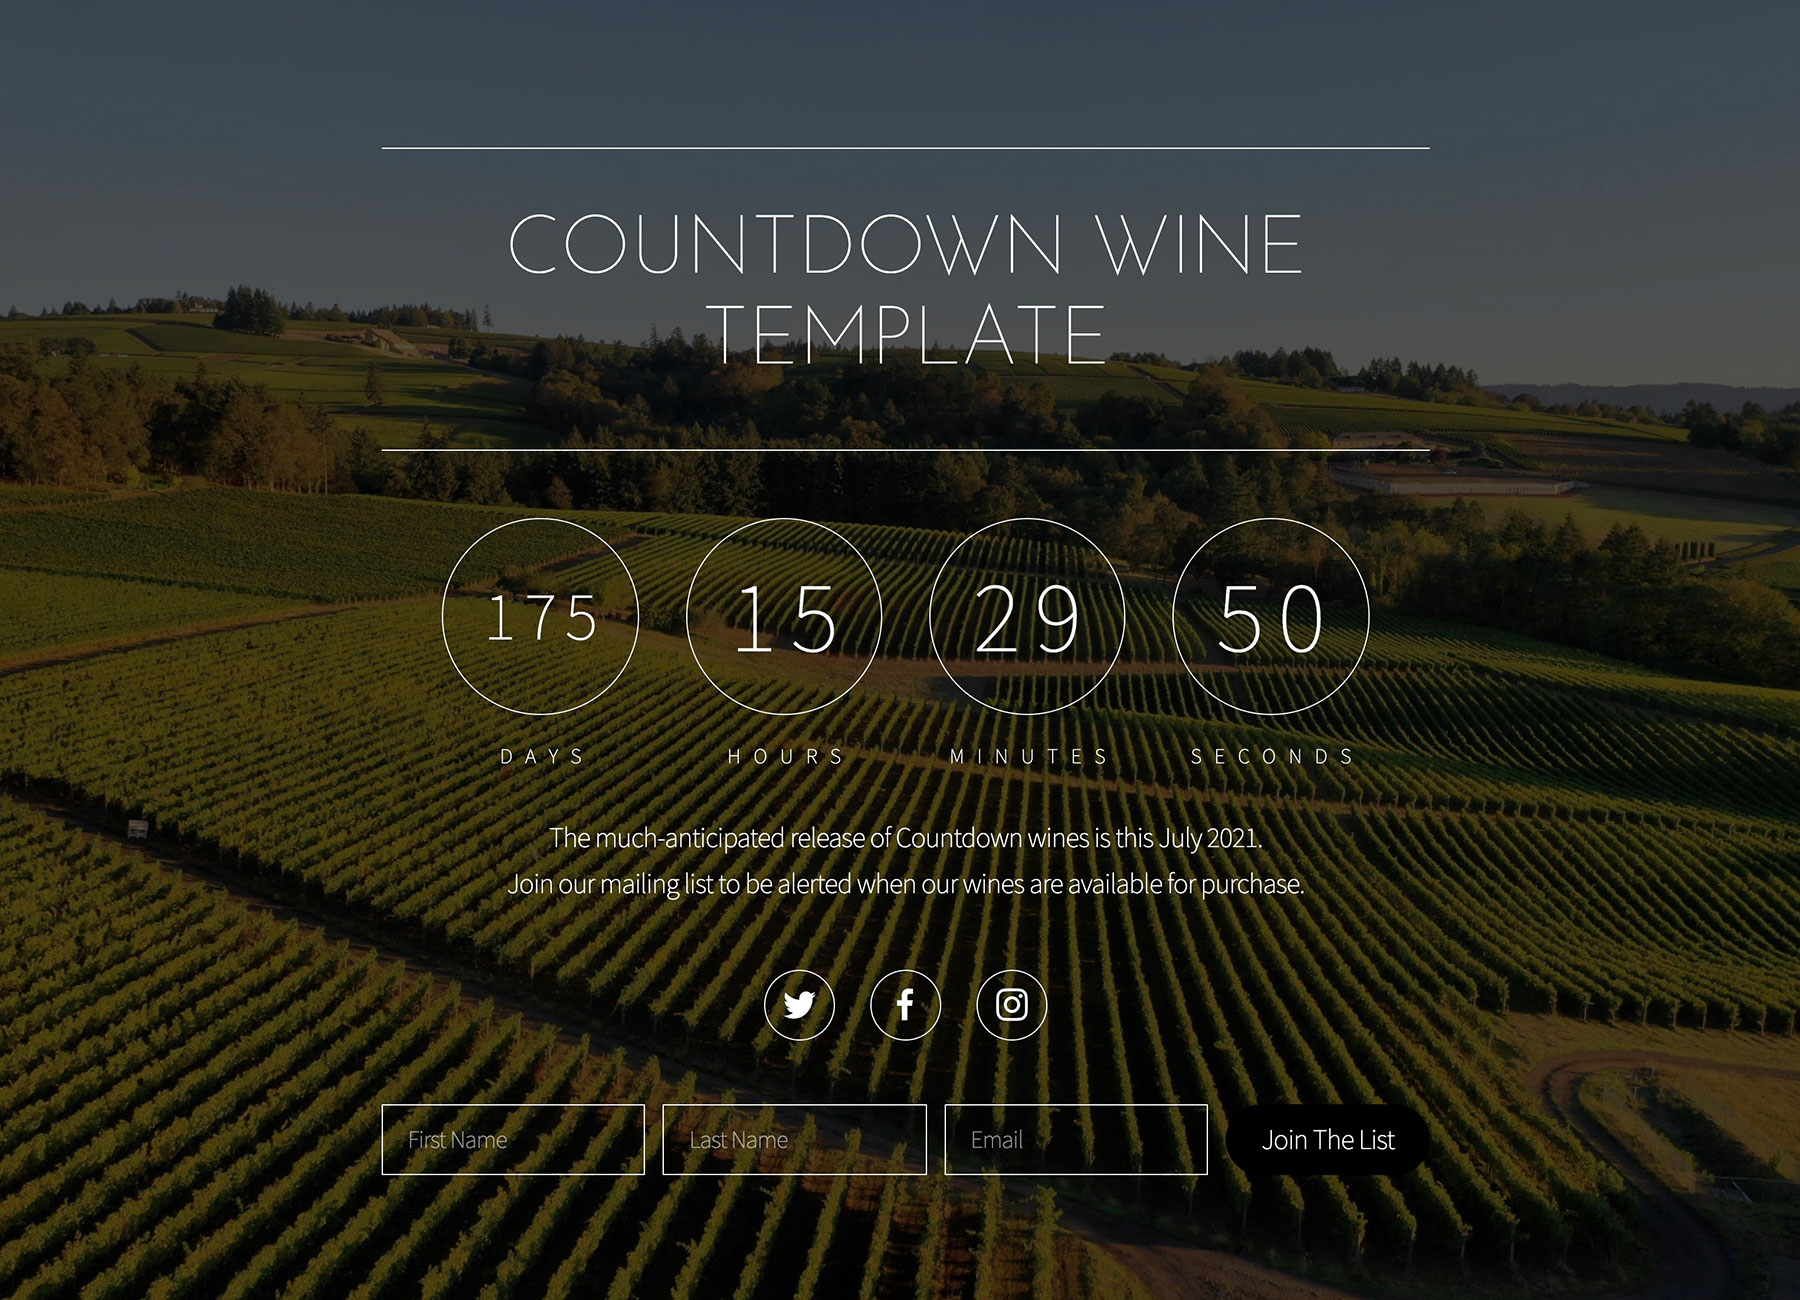 Countdown website example.